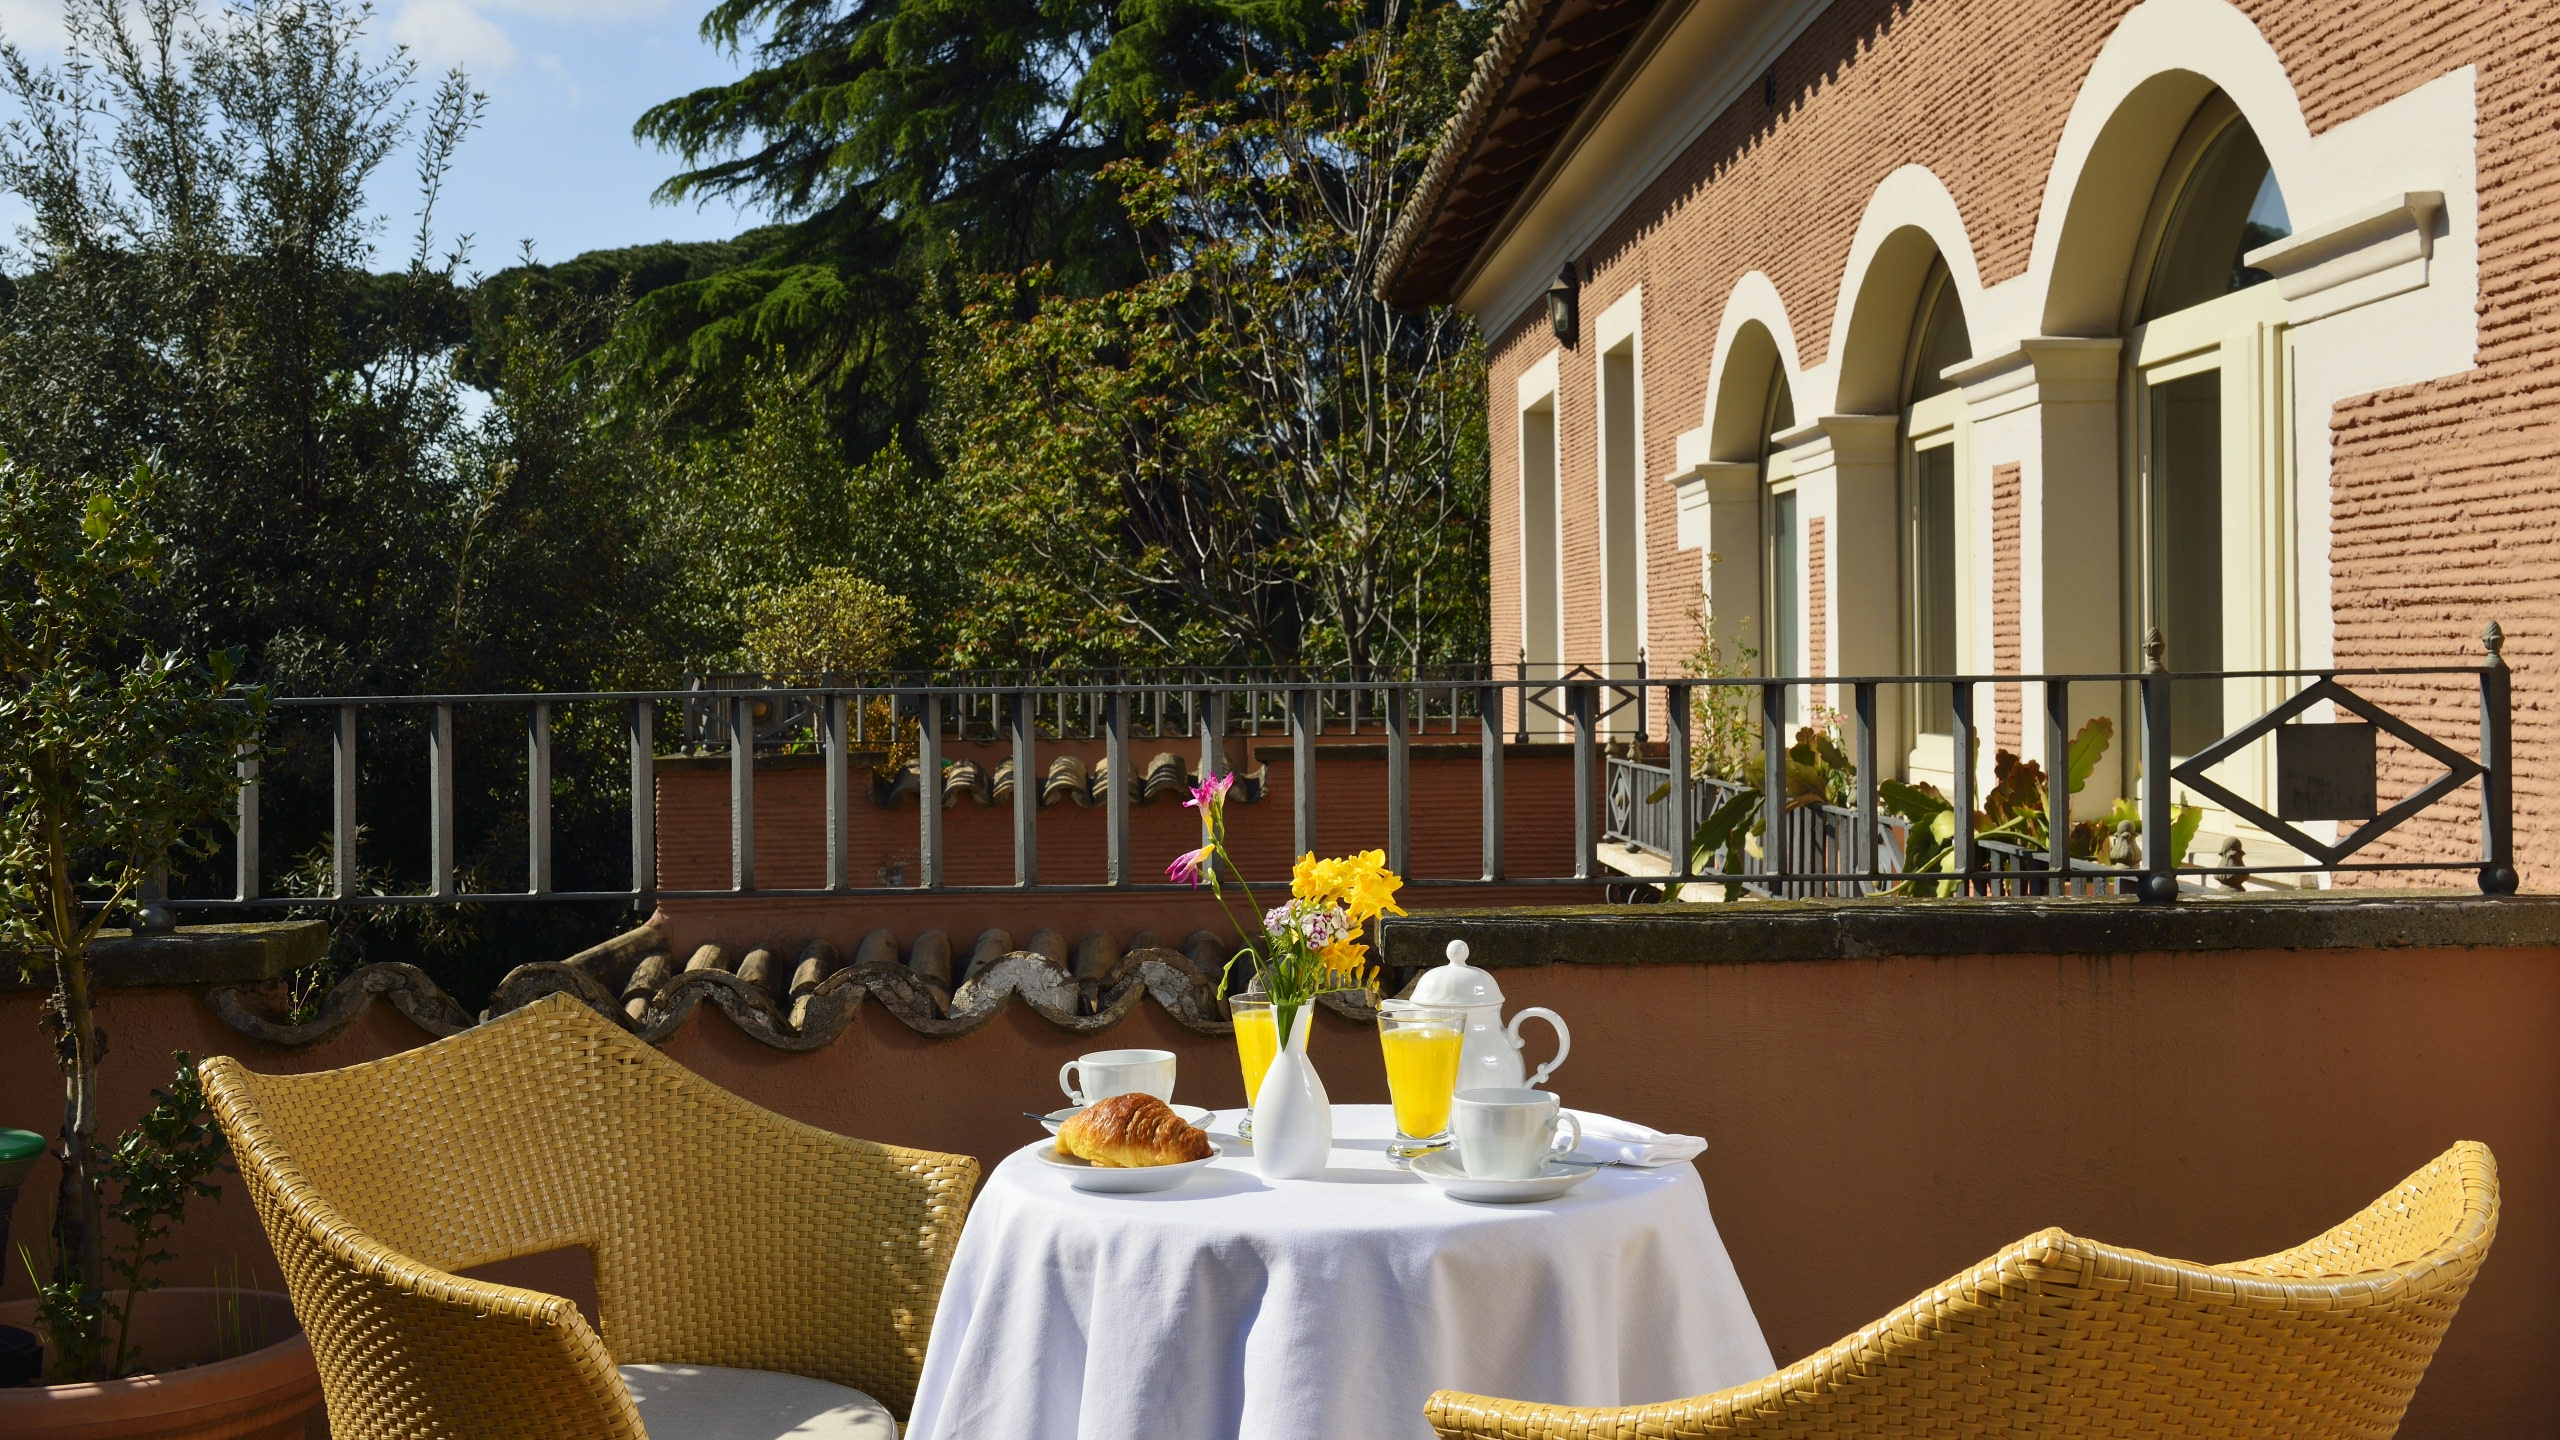 hotel-principe-torlonia-external-06